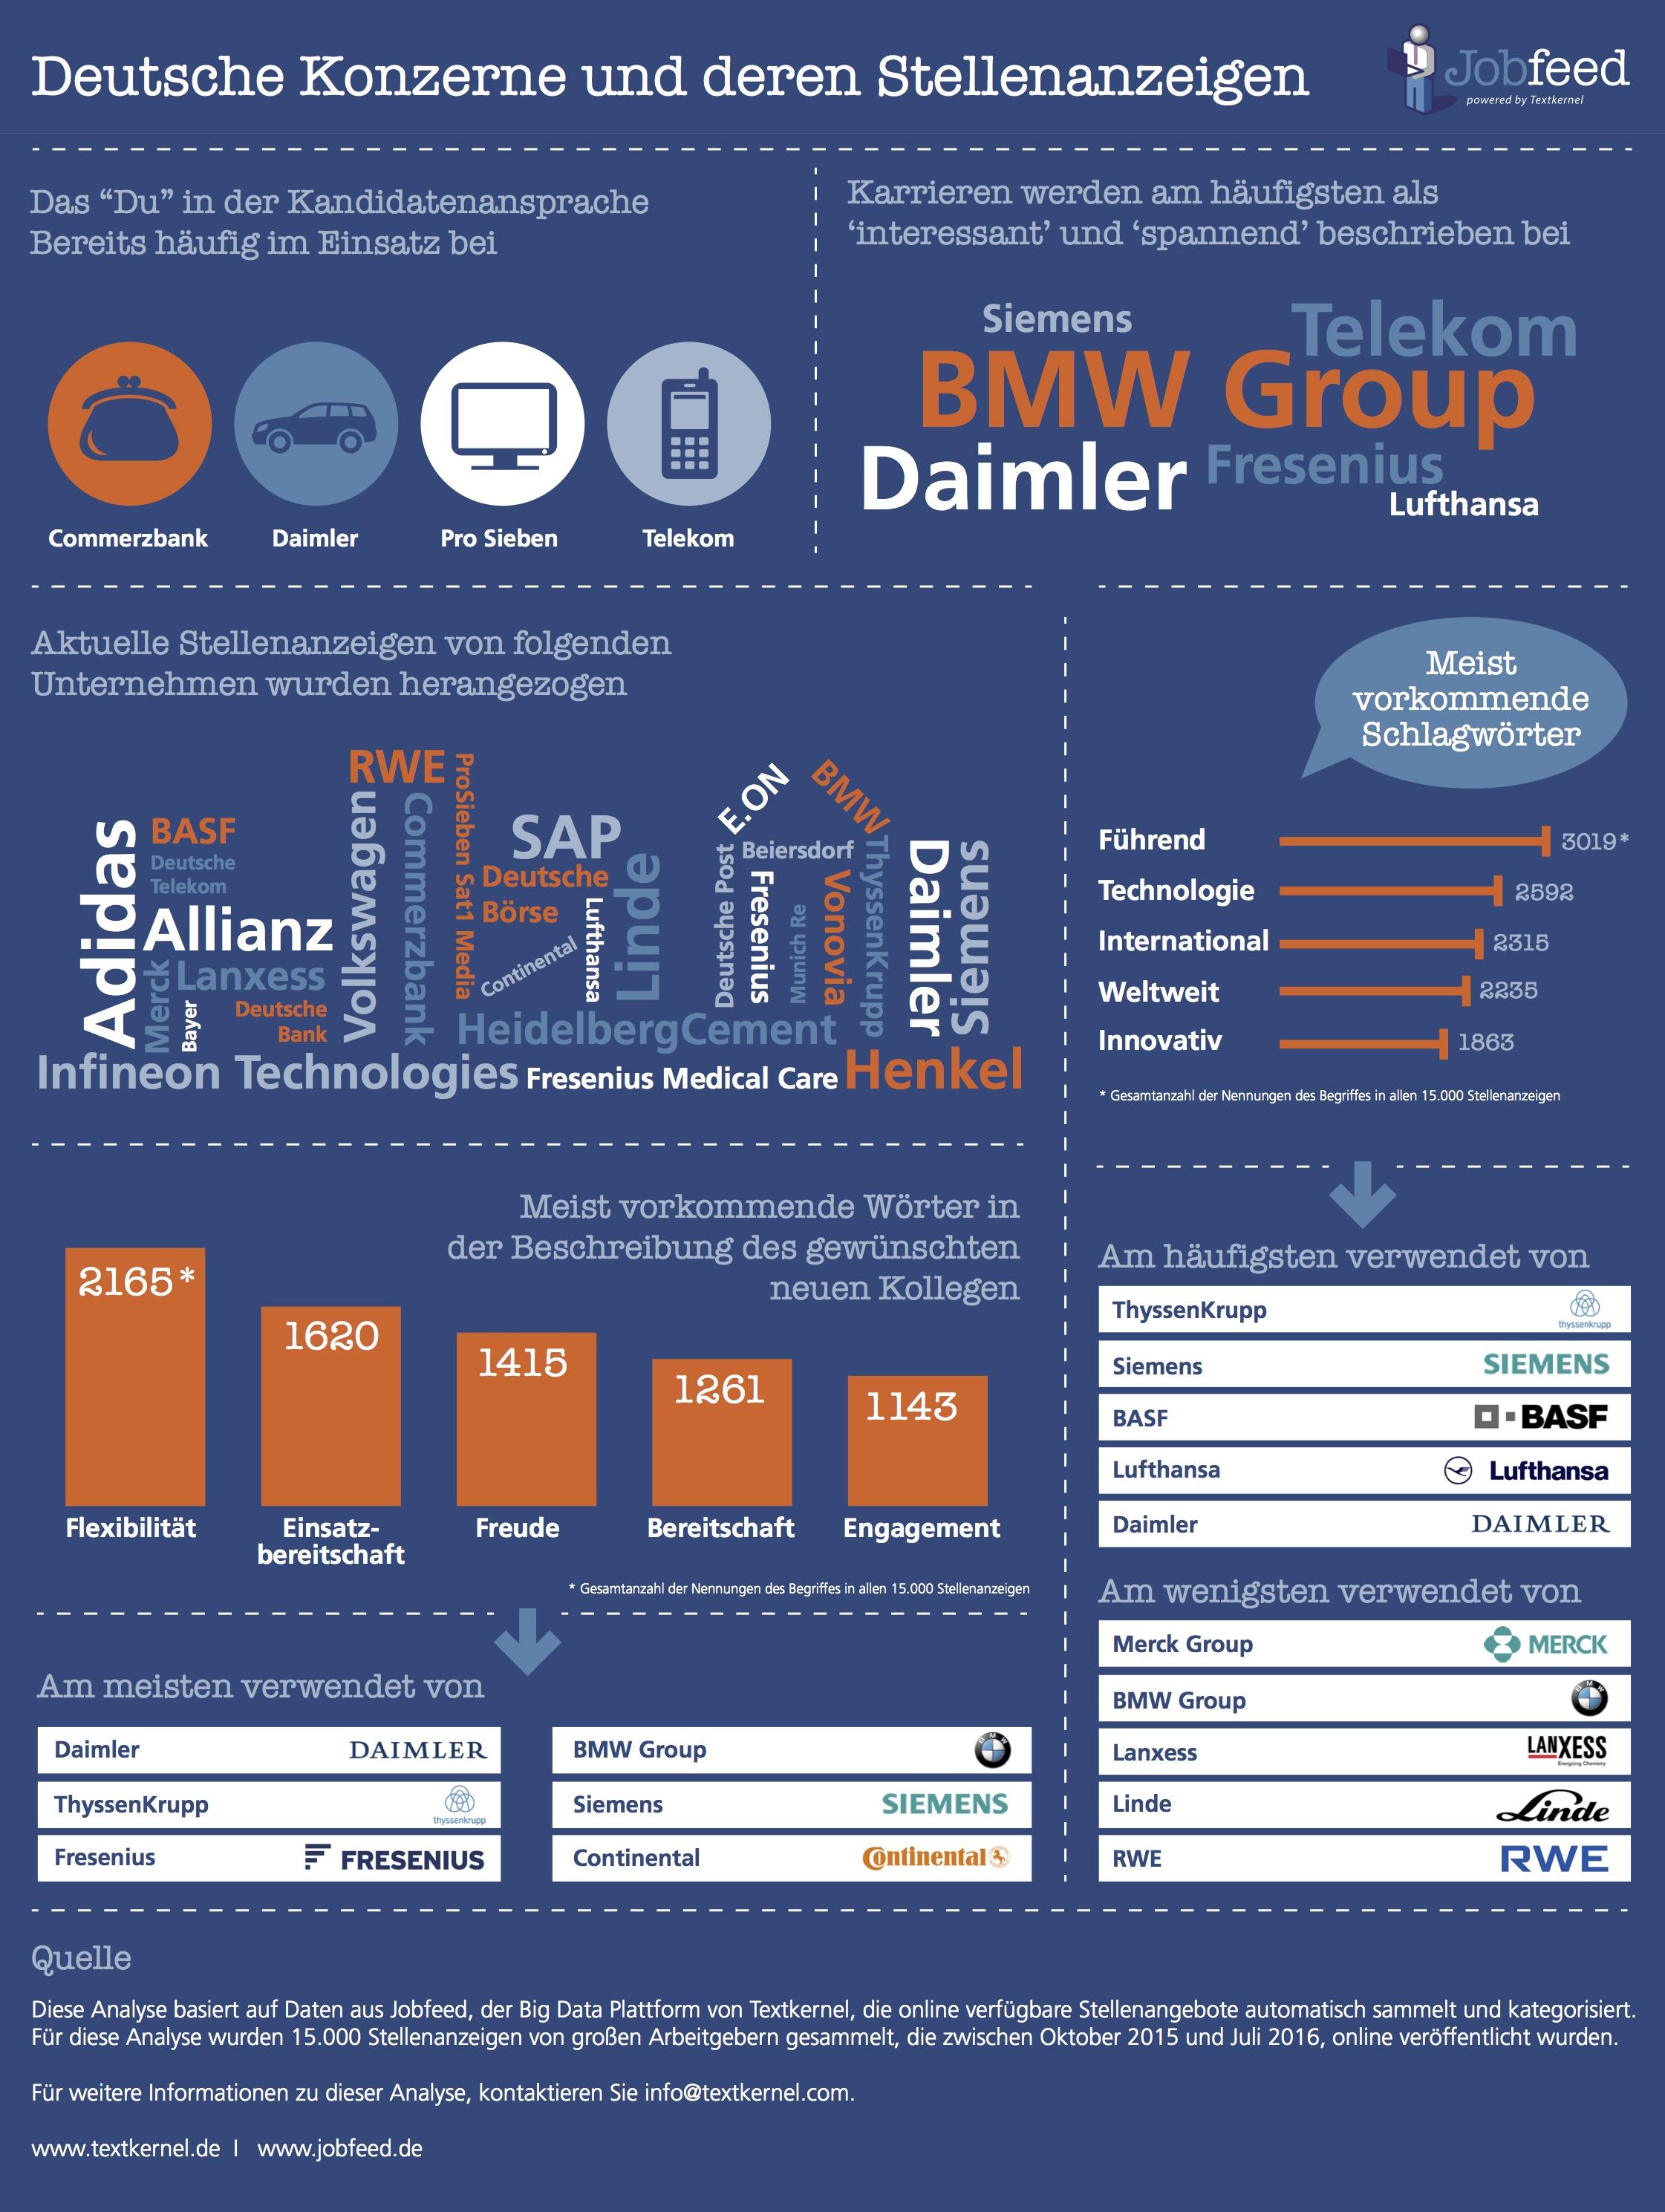 TEXT-047-infographic-doelgroep D-V2 (2)